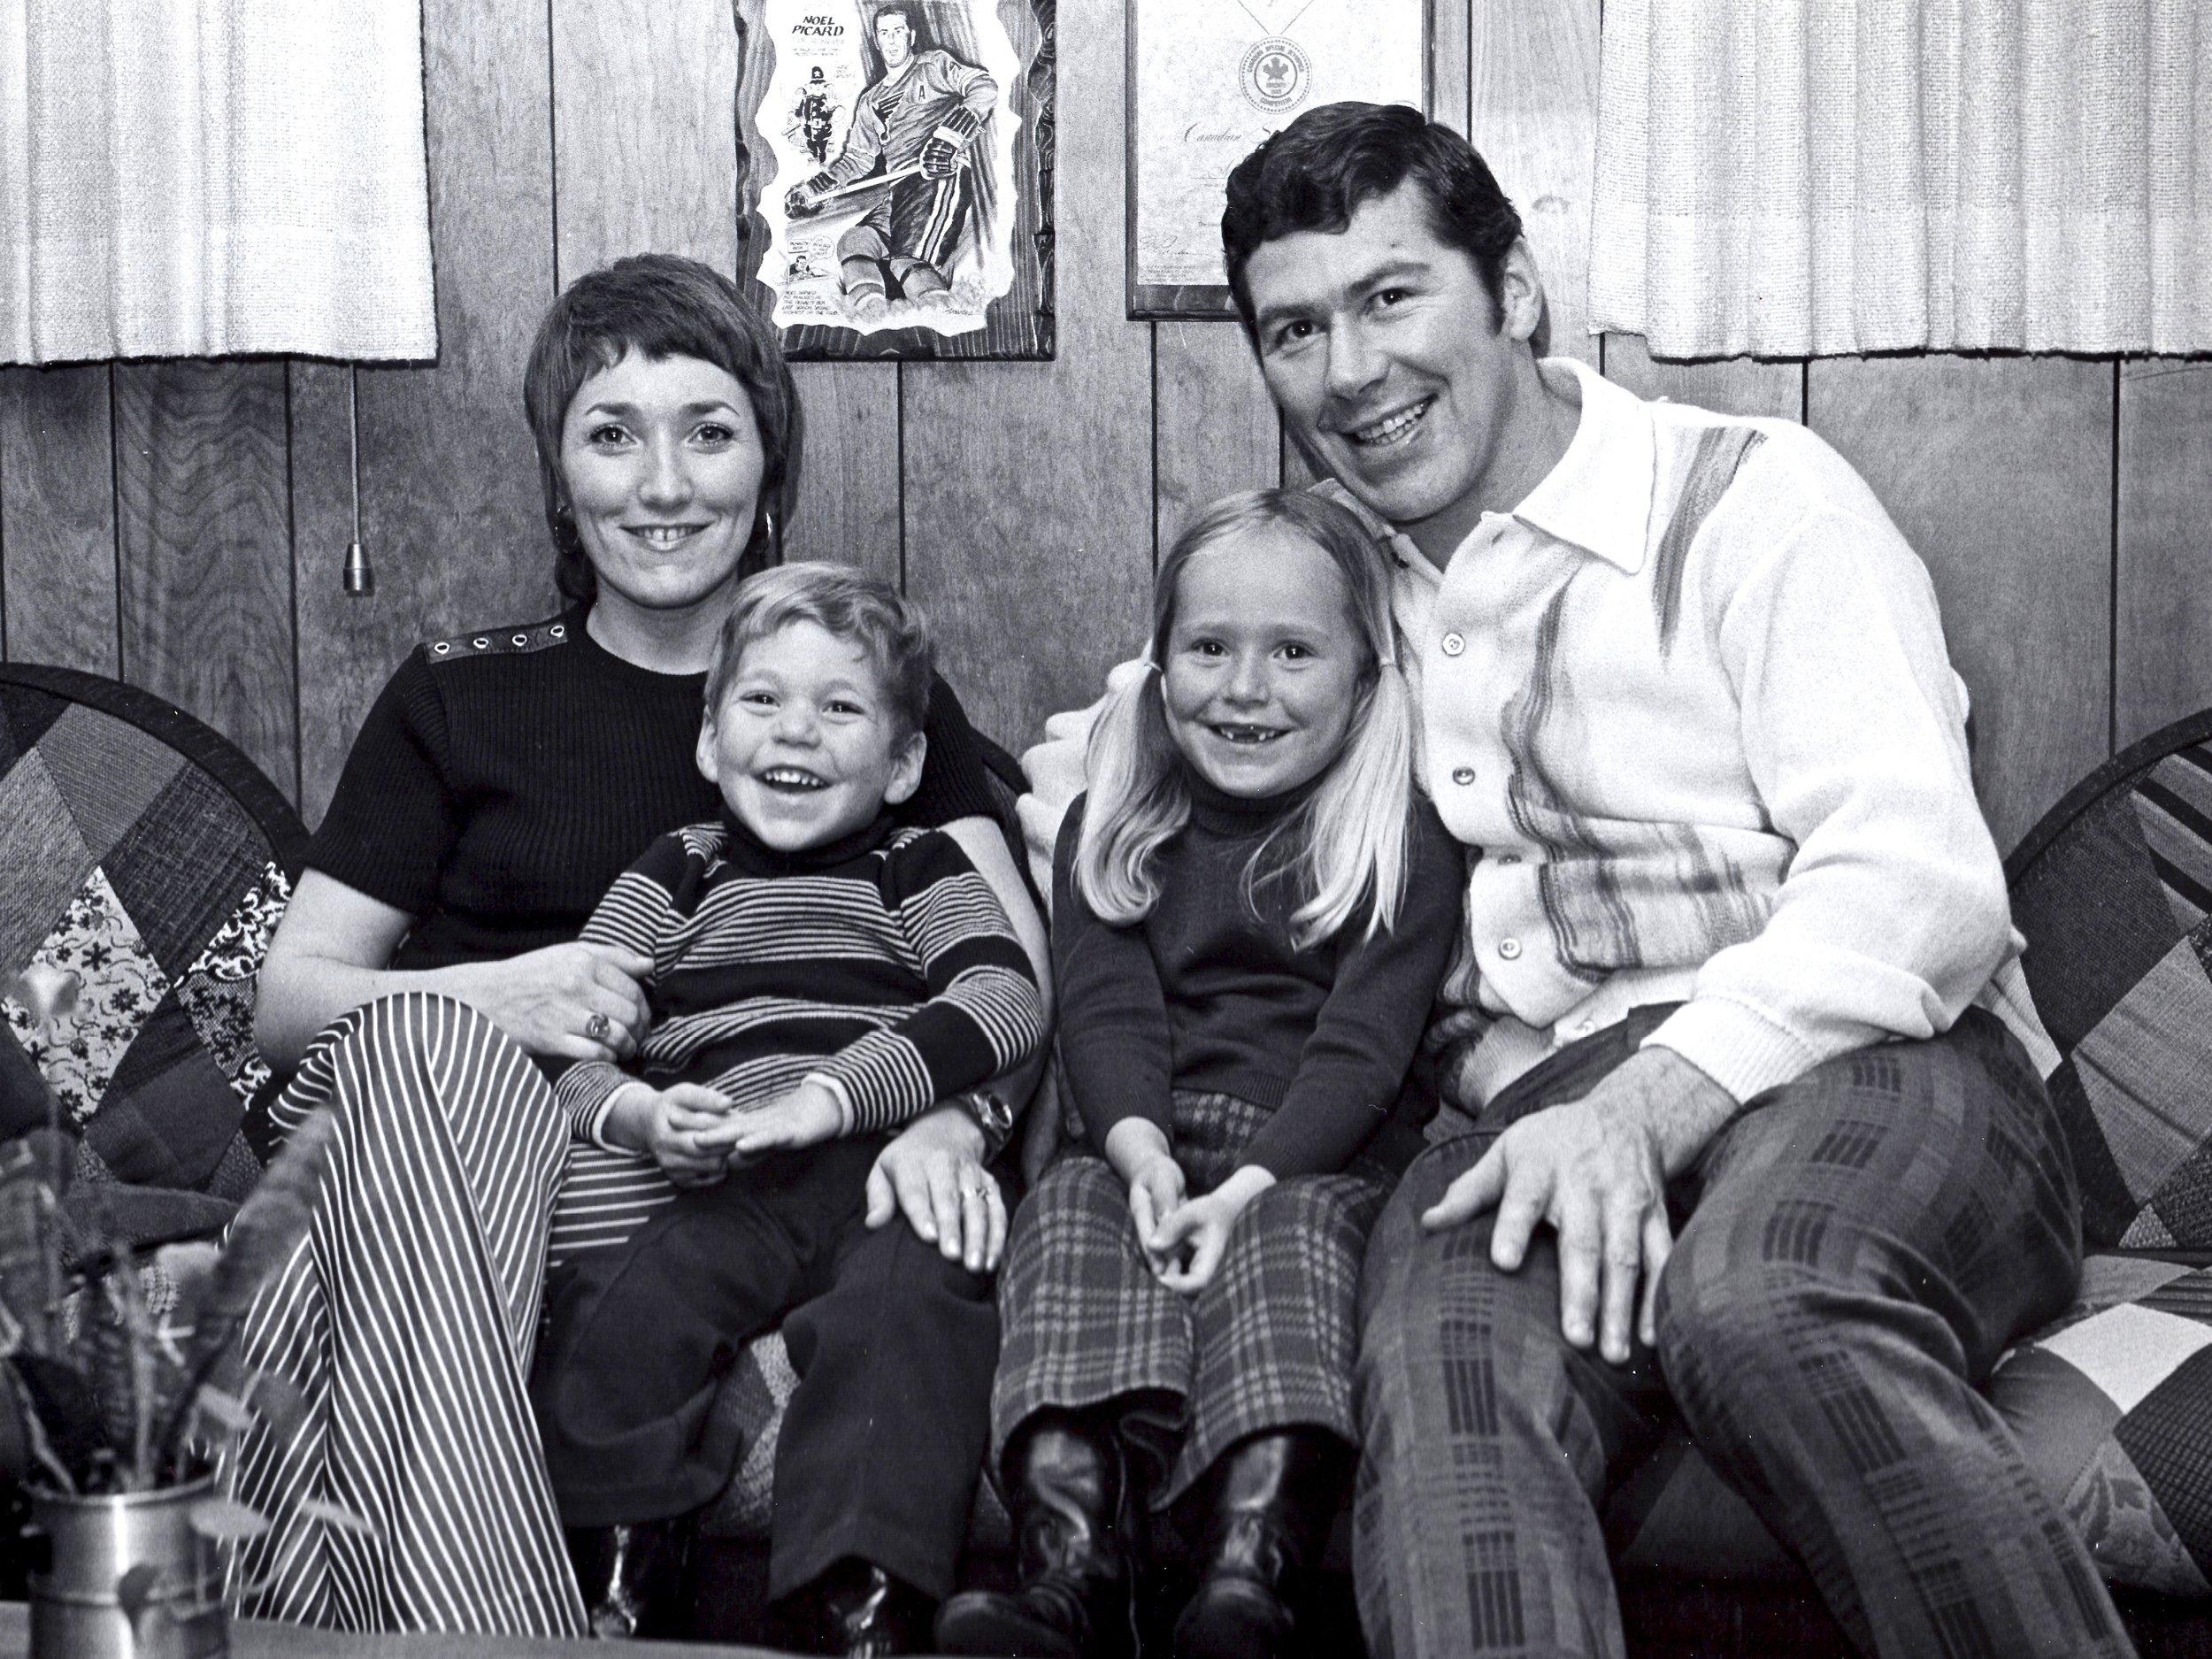 My family, circa 1970